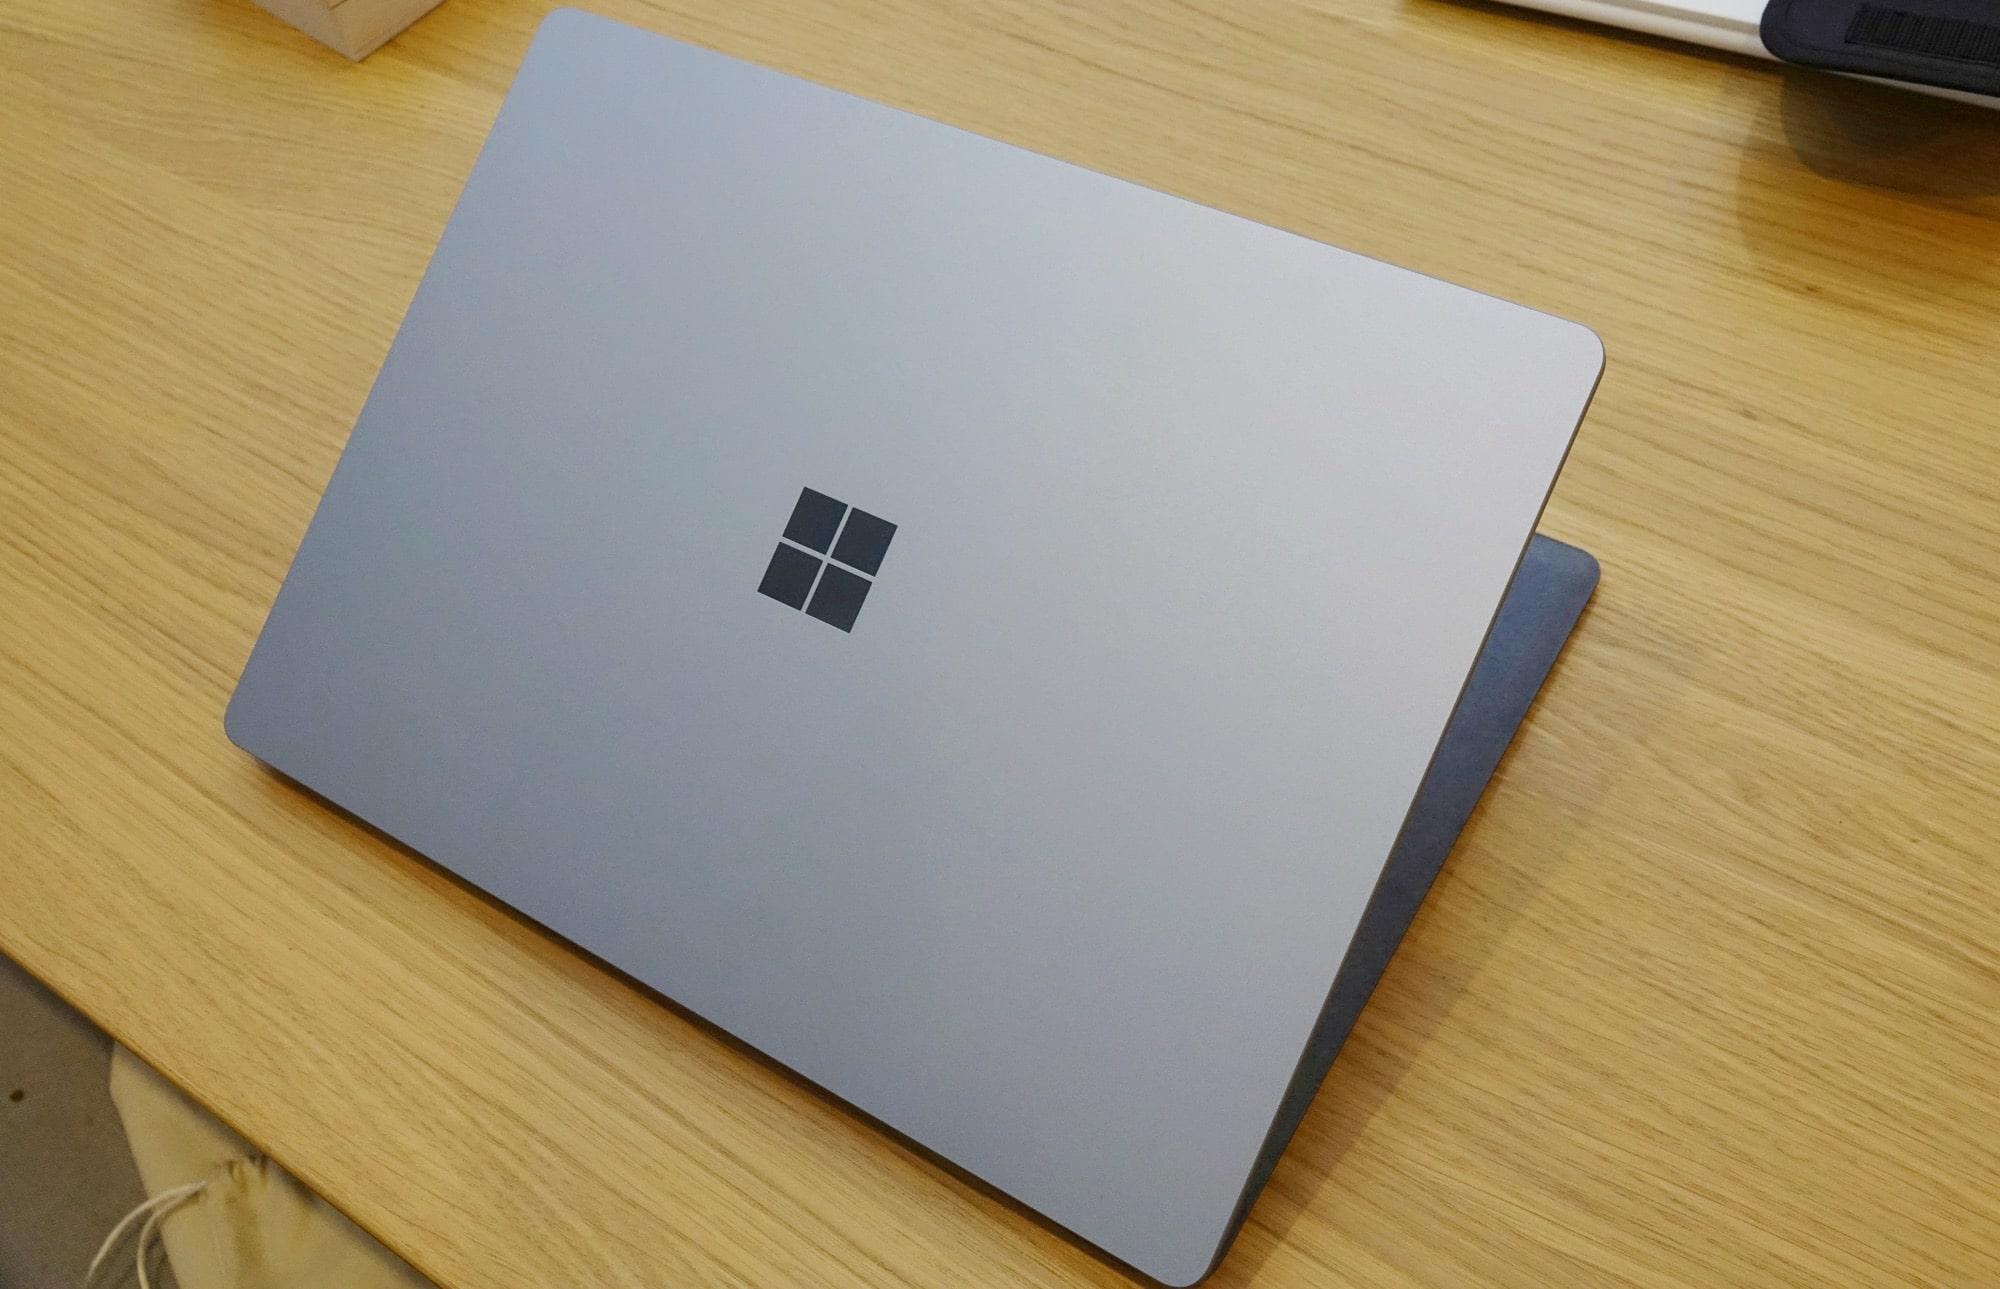 Microsoft Surface Laptop 4 reviewed